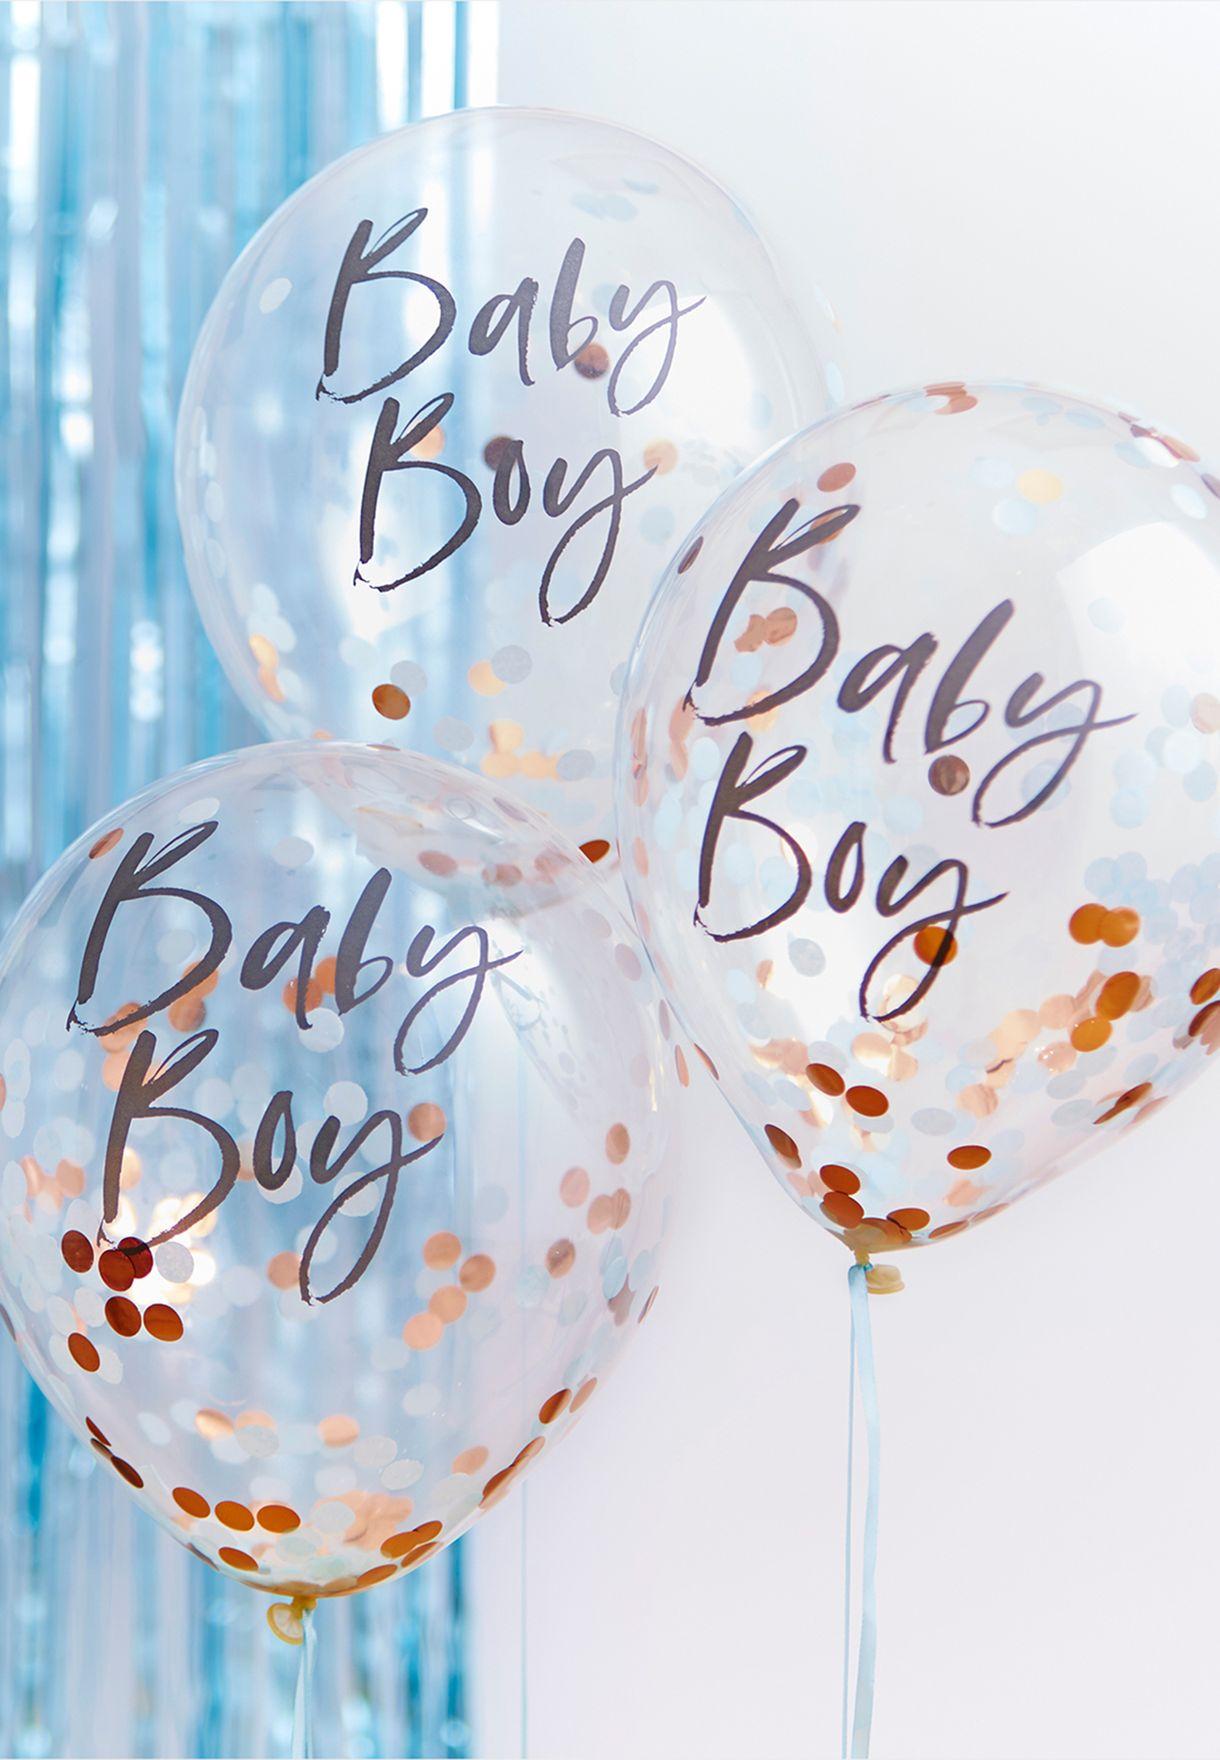 Confetti Balloons - Baby Boy - 5 Pack